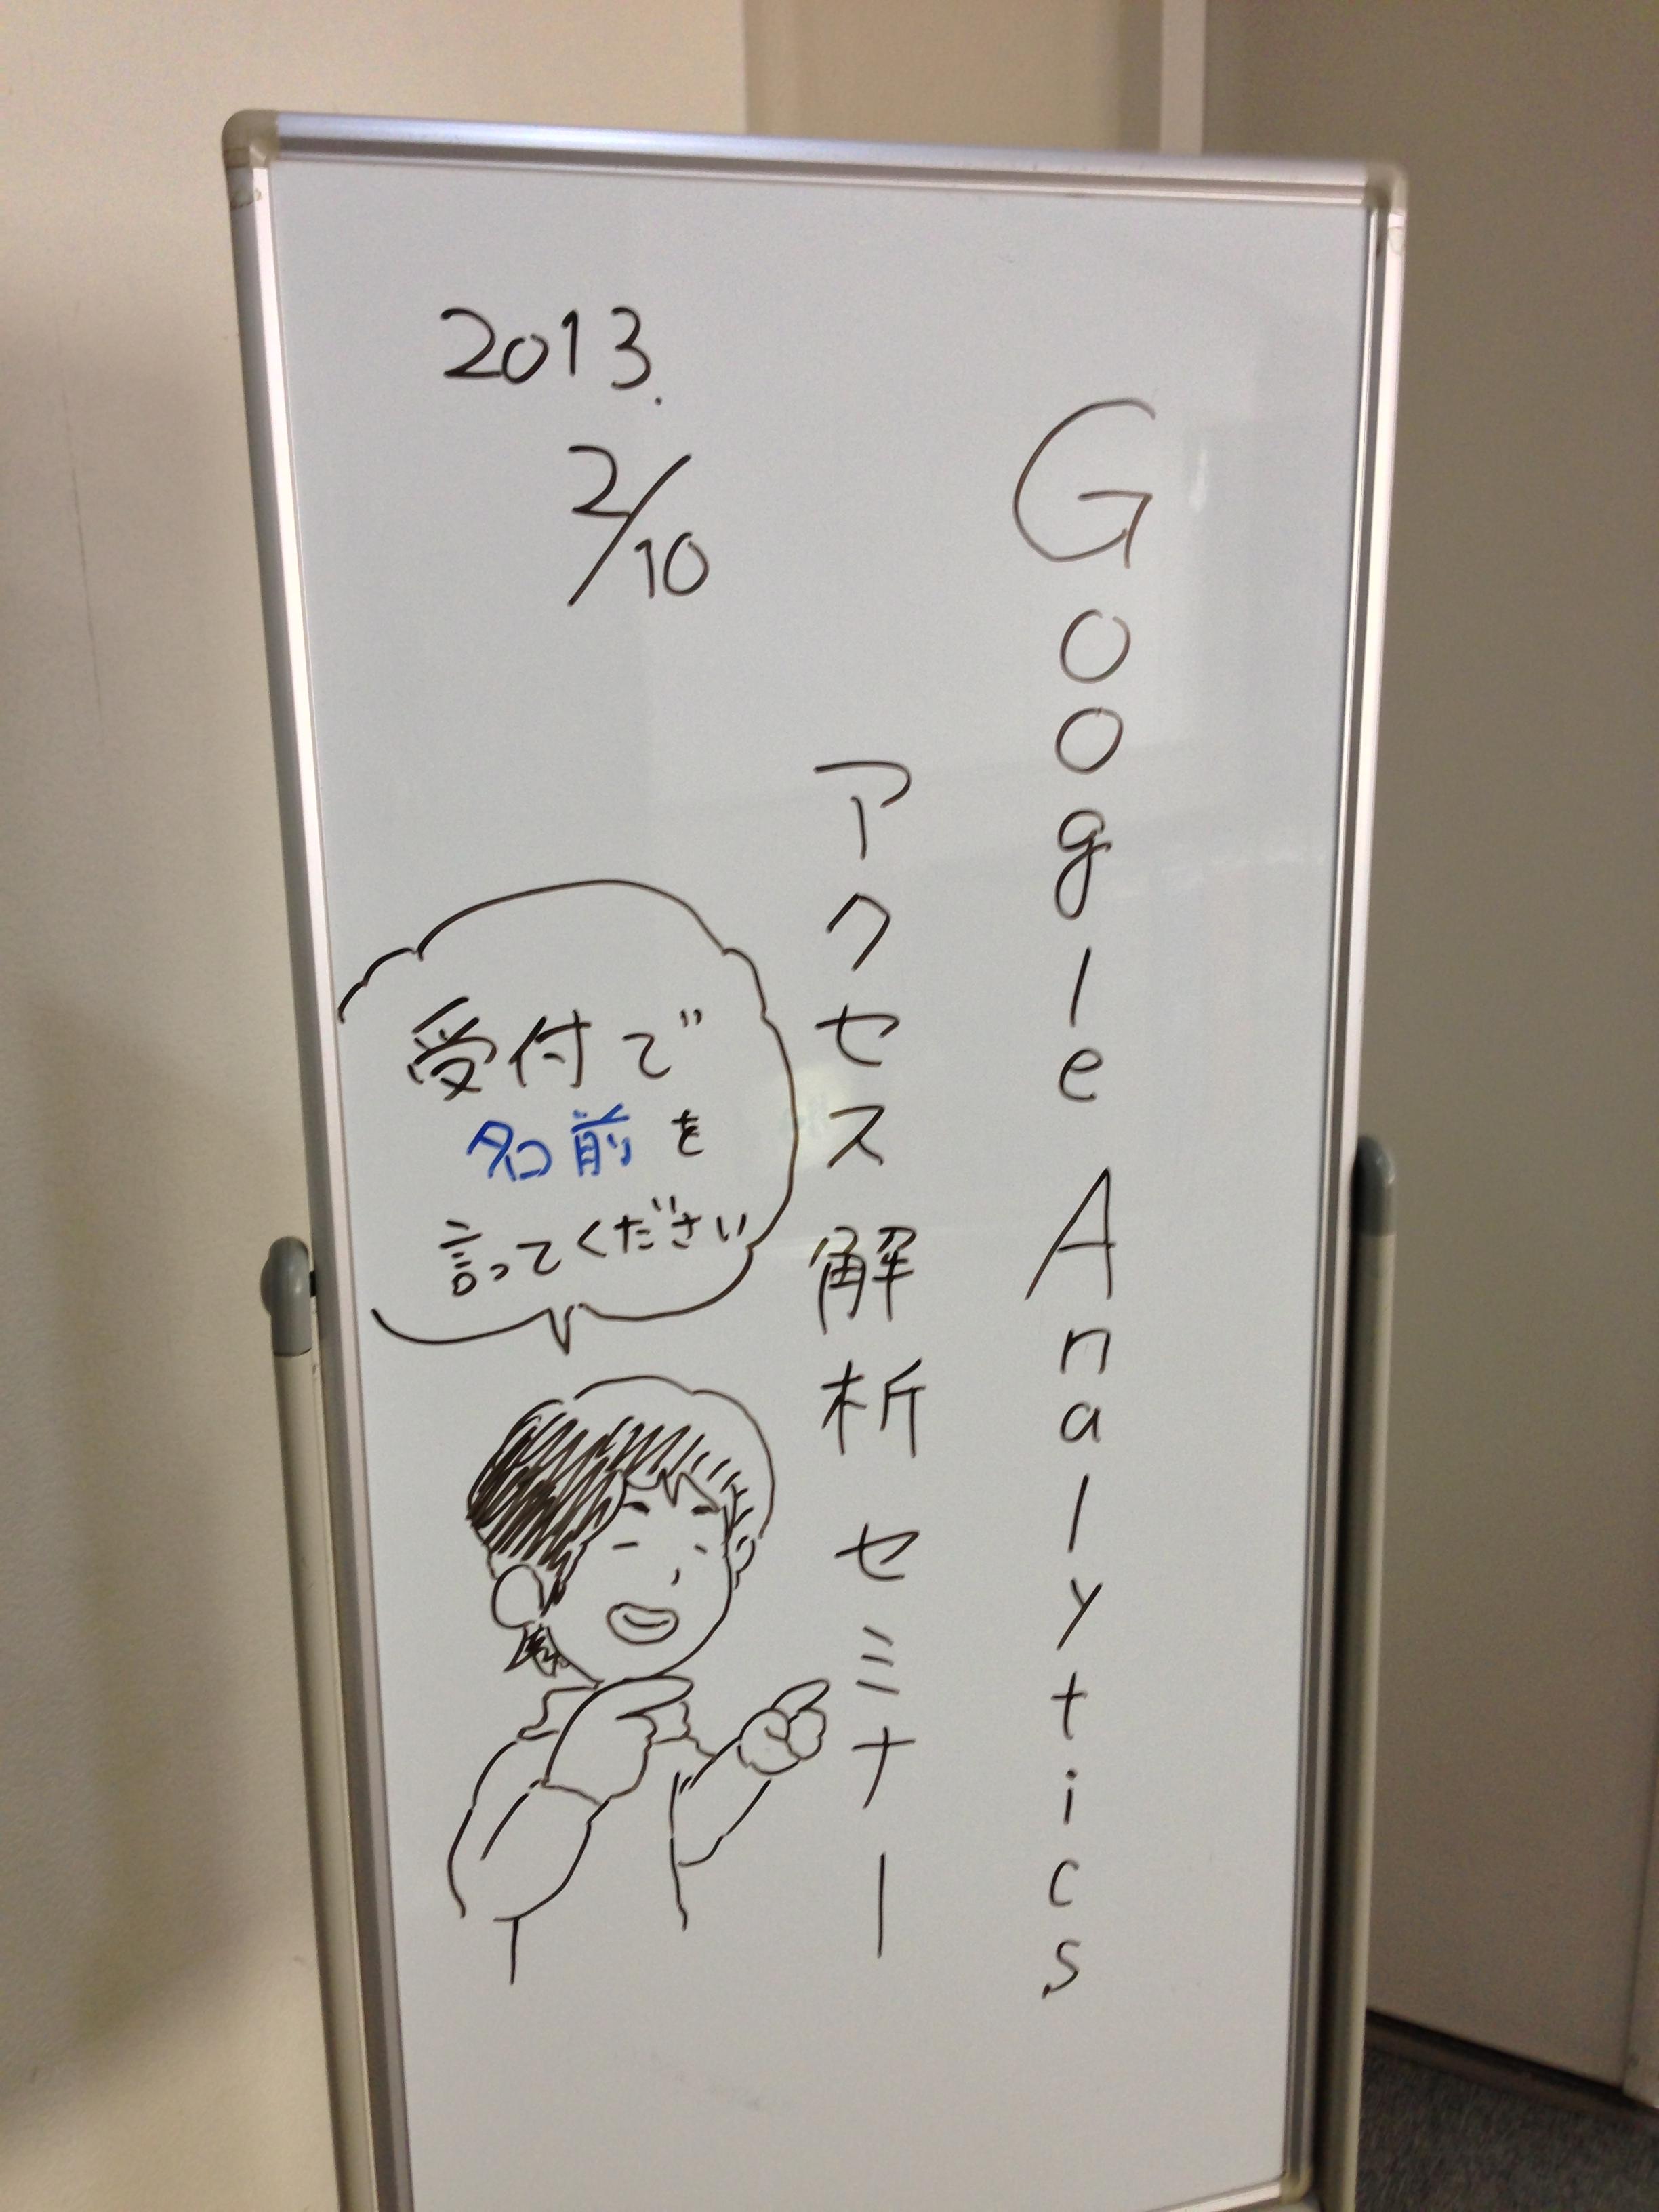 Google Analyticsアクセス解析セミナーに参加(週刊 東京散歩ぽ2/11)